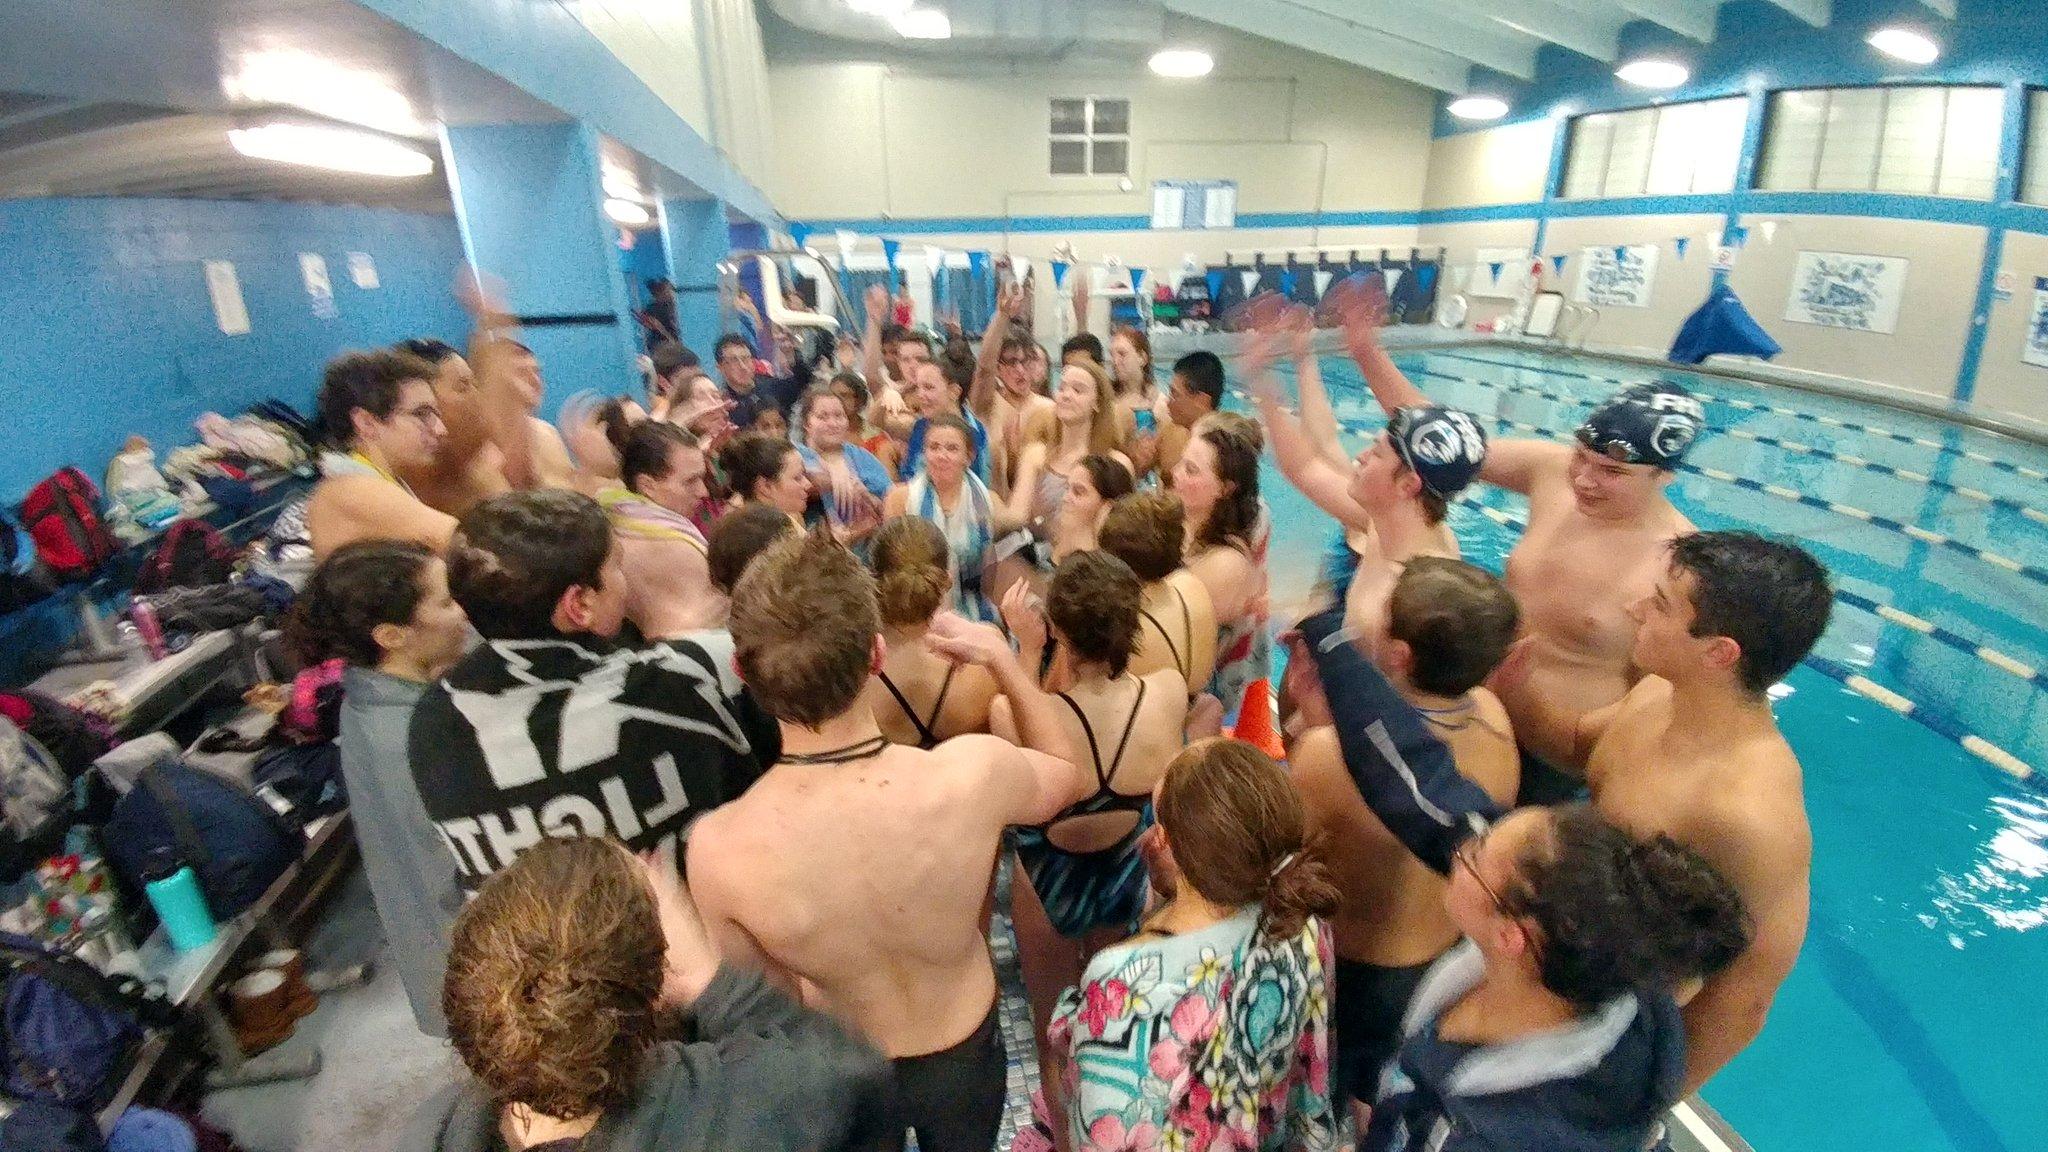 FHS swim team celebrates (via @coachB_fhs)